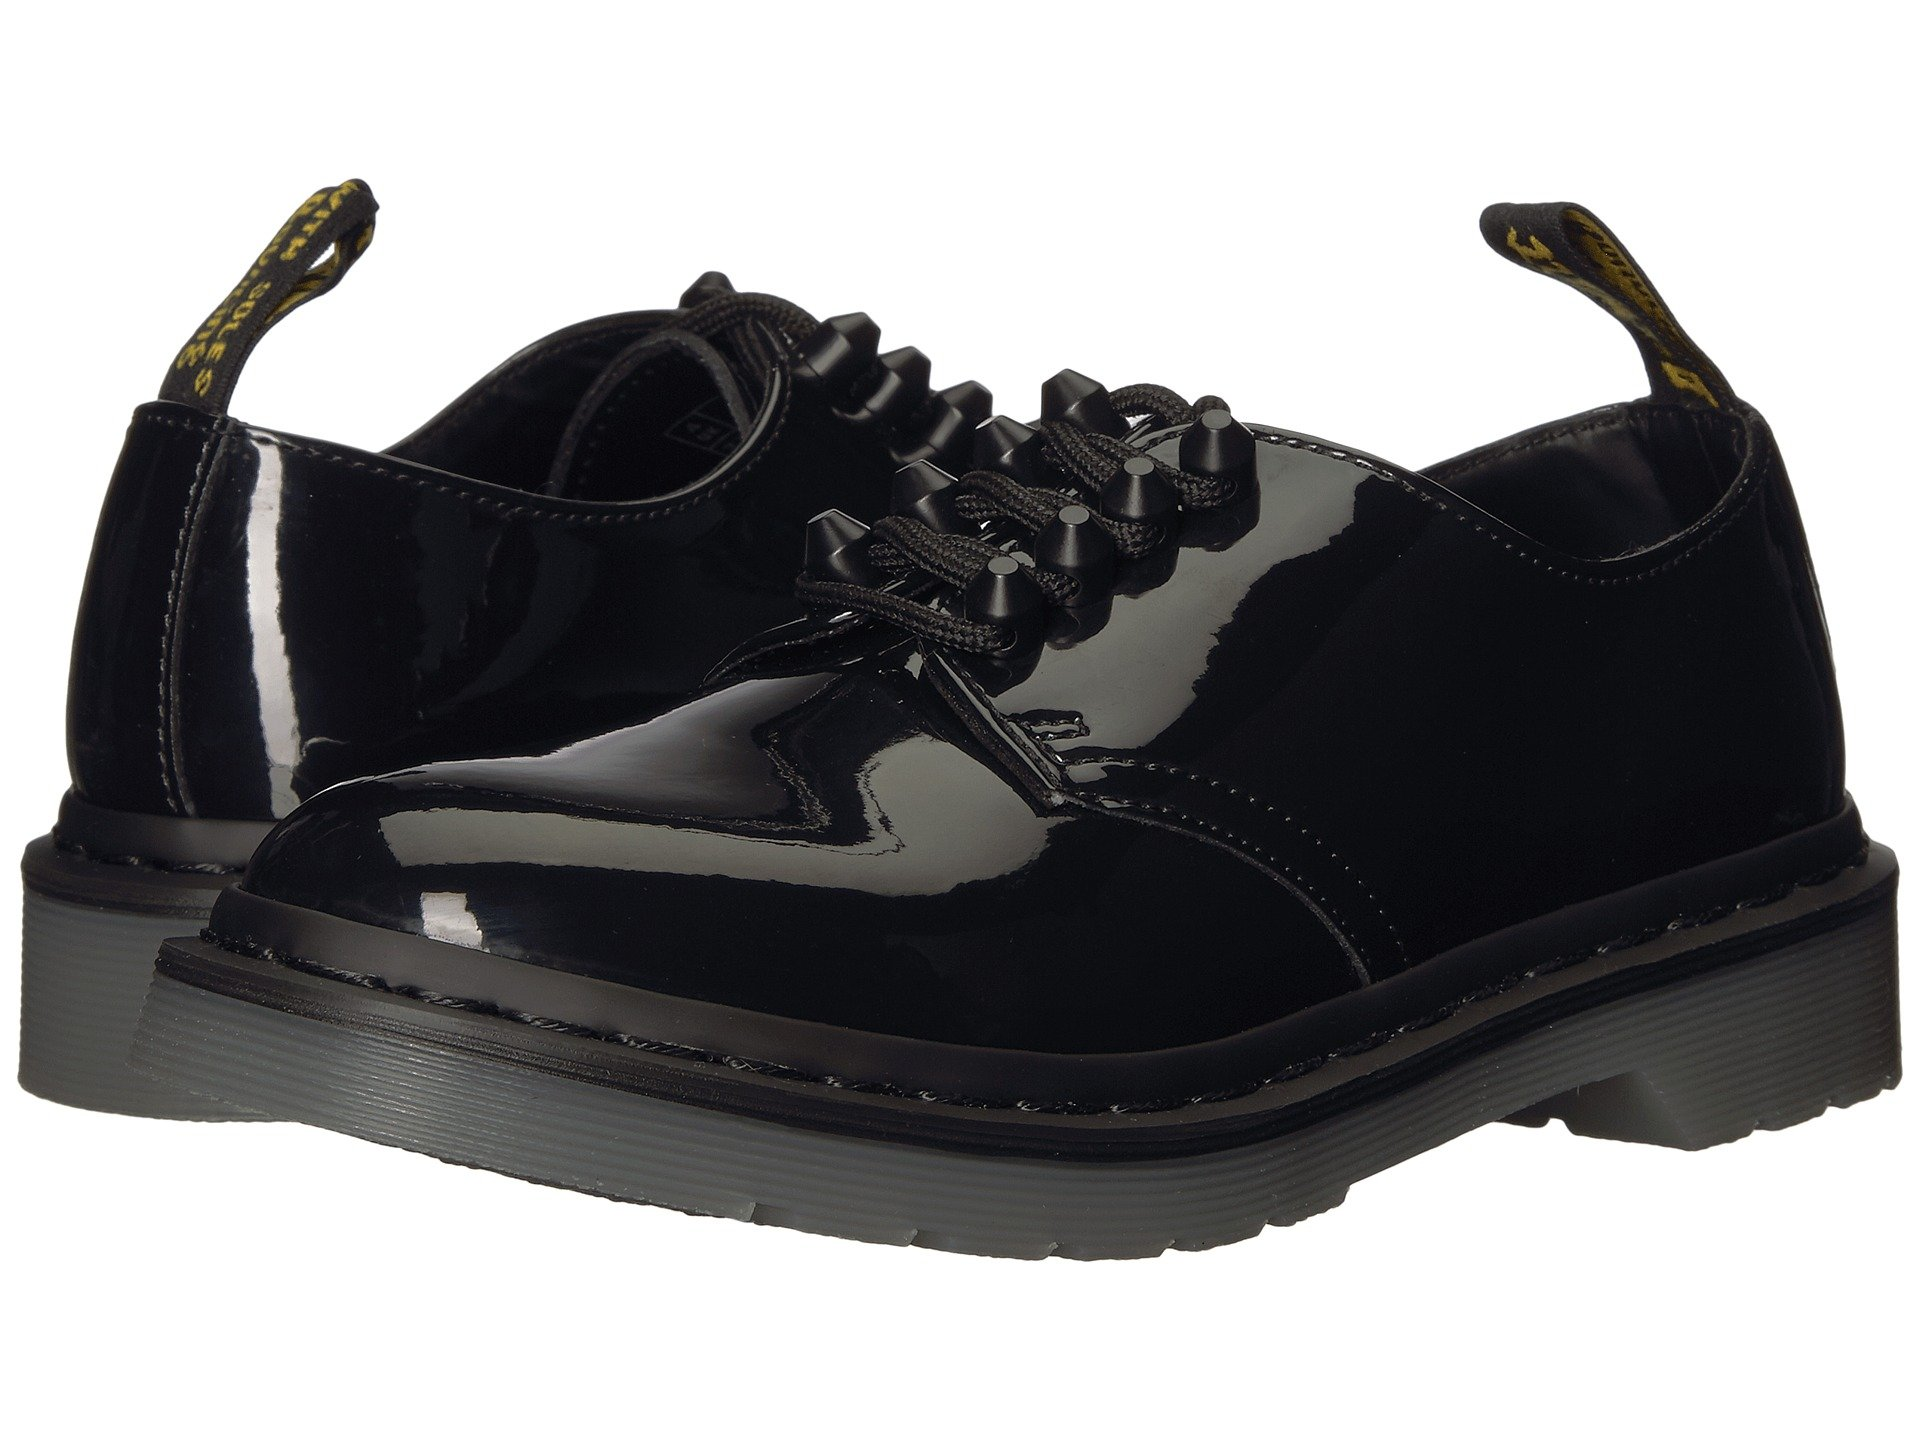 Smiths Stud 4-Eye Shoe Dr. Martens 21lznm2dc